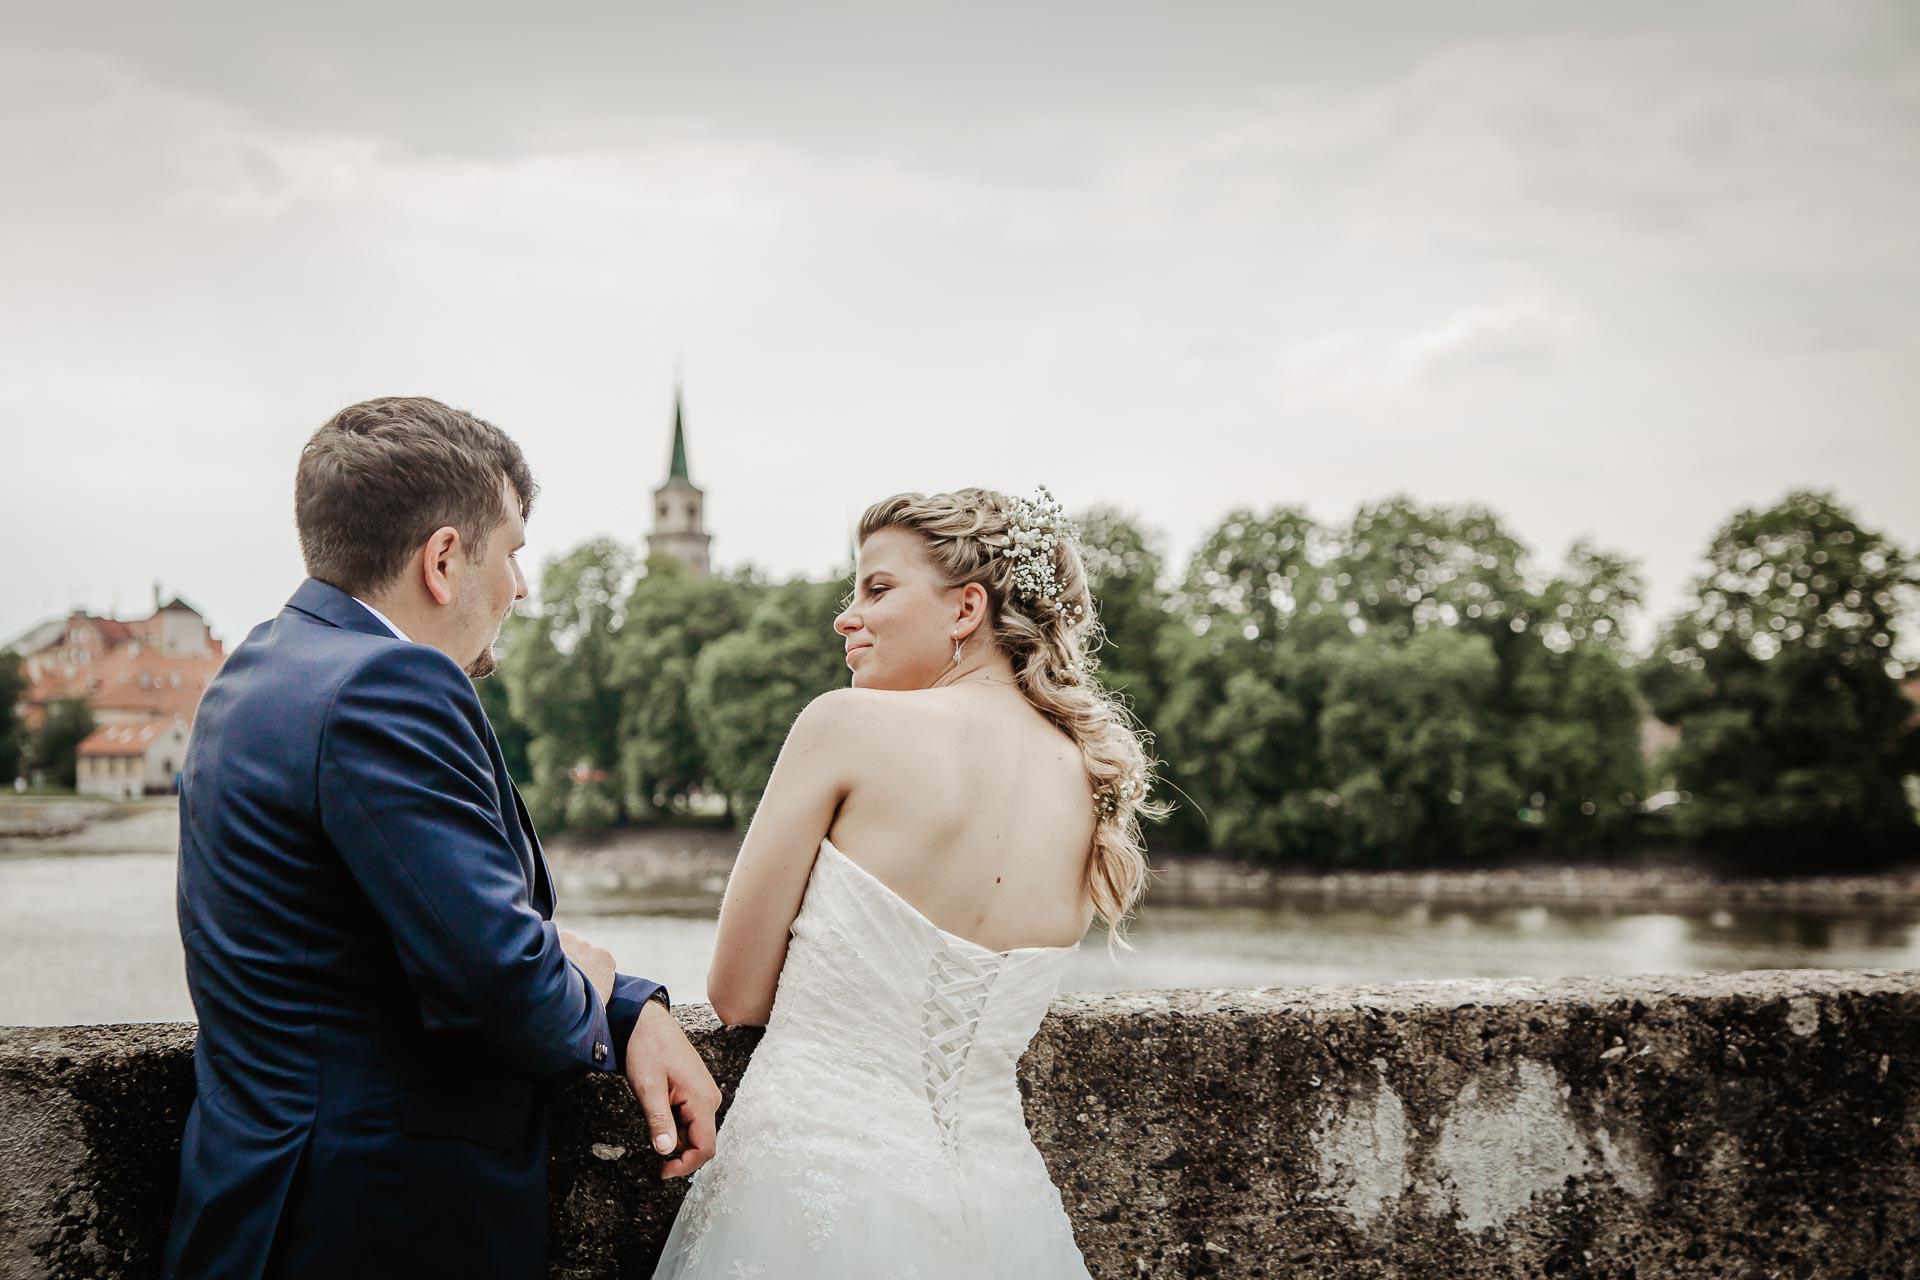 Svatební-fotograf-Nymburk-6128